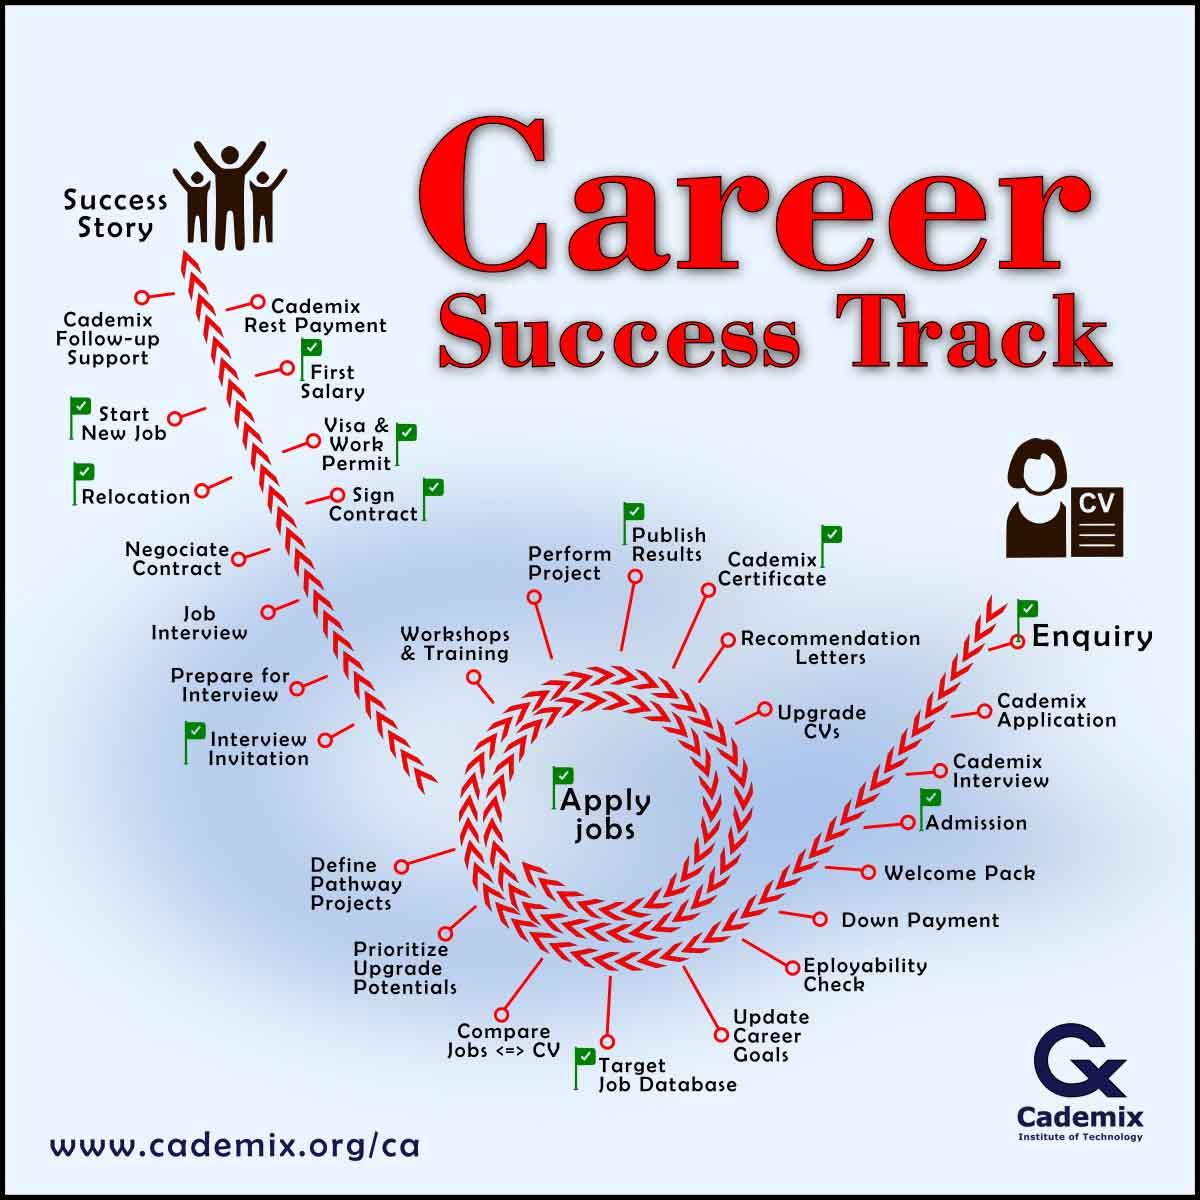 Success Track toward Job Placement - Details of Cademix Career Autopilot Program